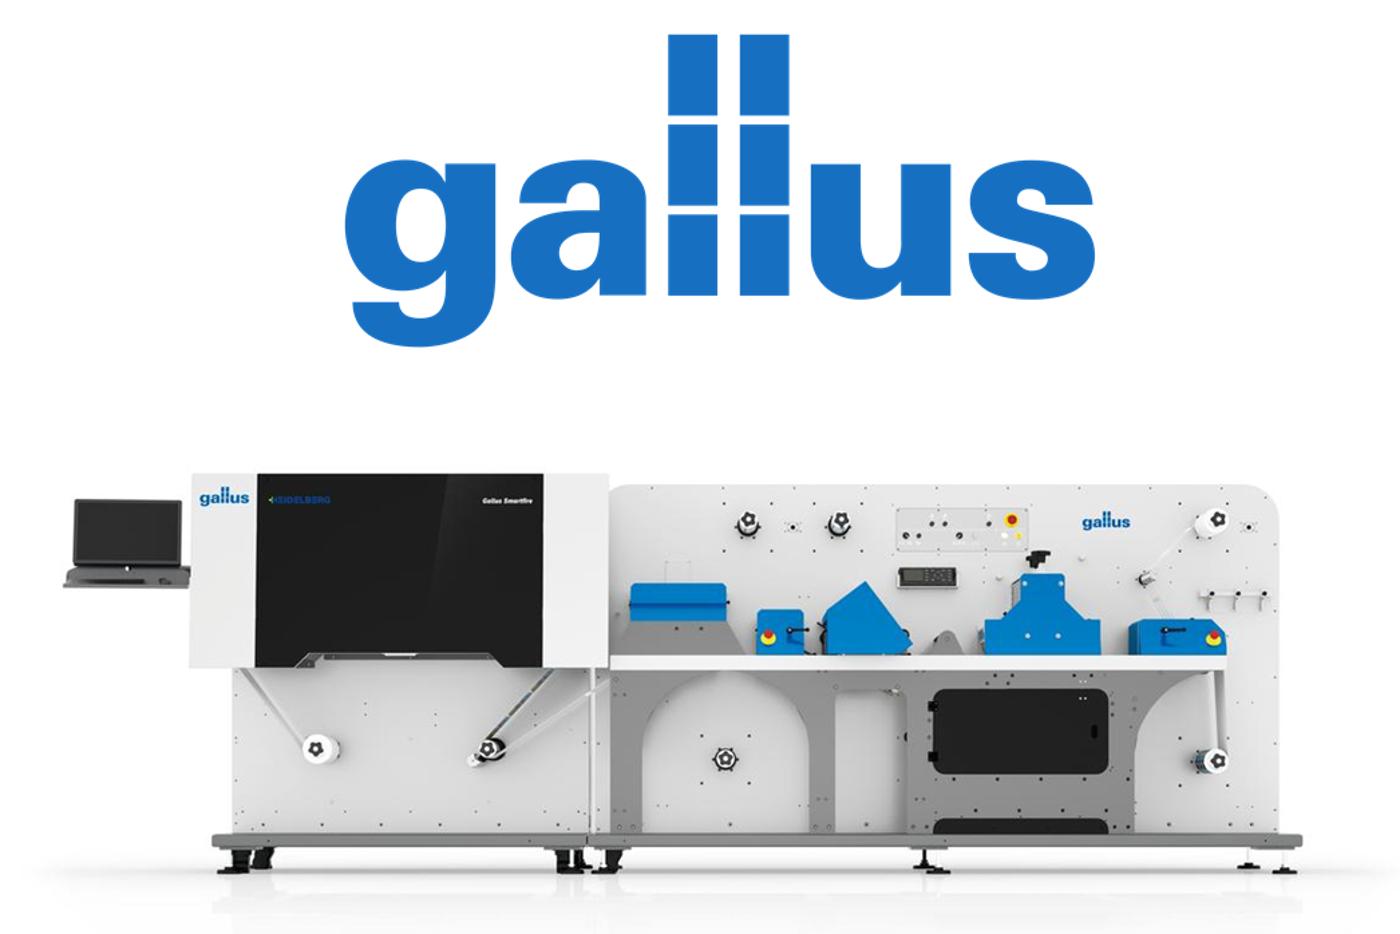 smartfire-and-gallus-logo